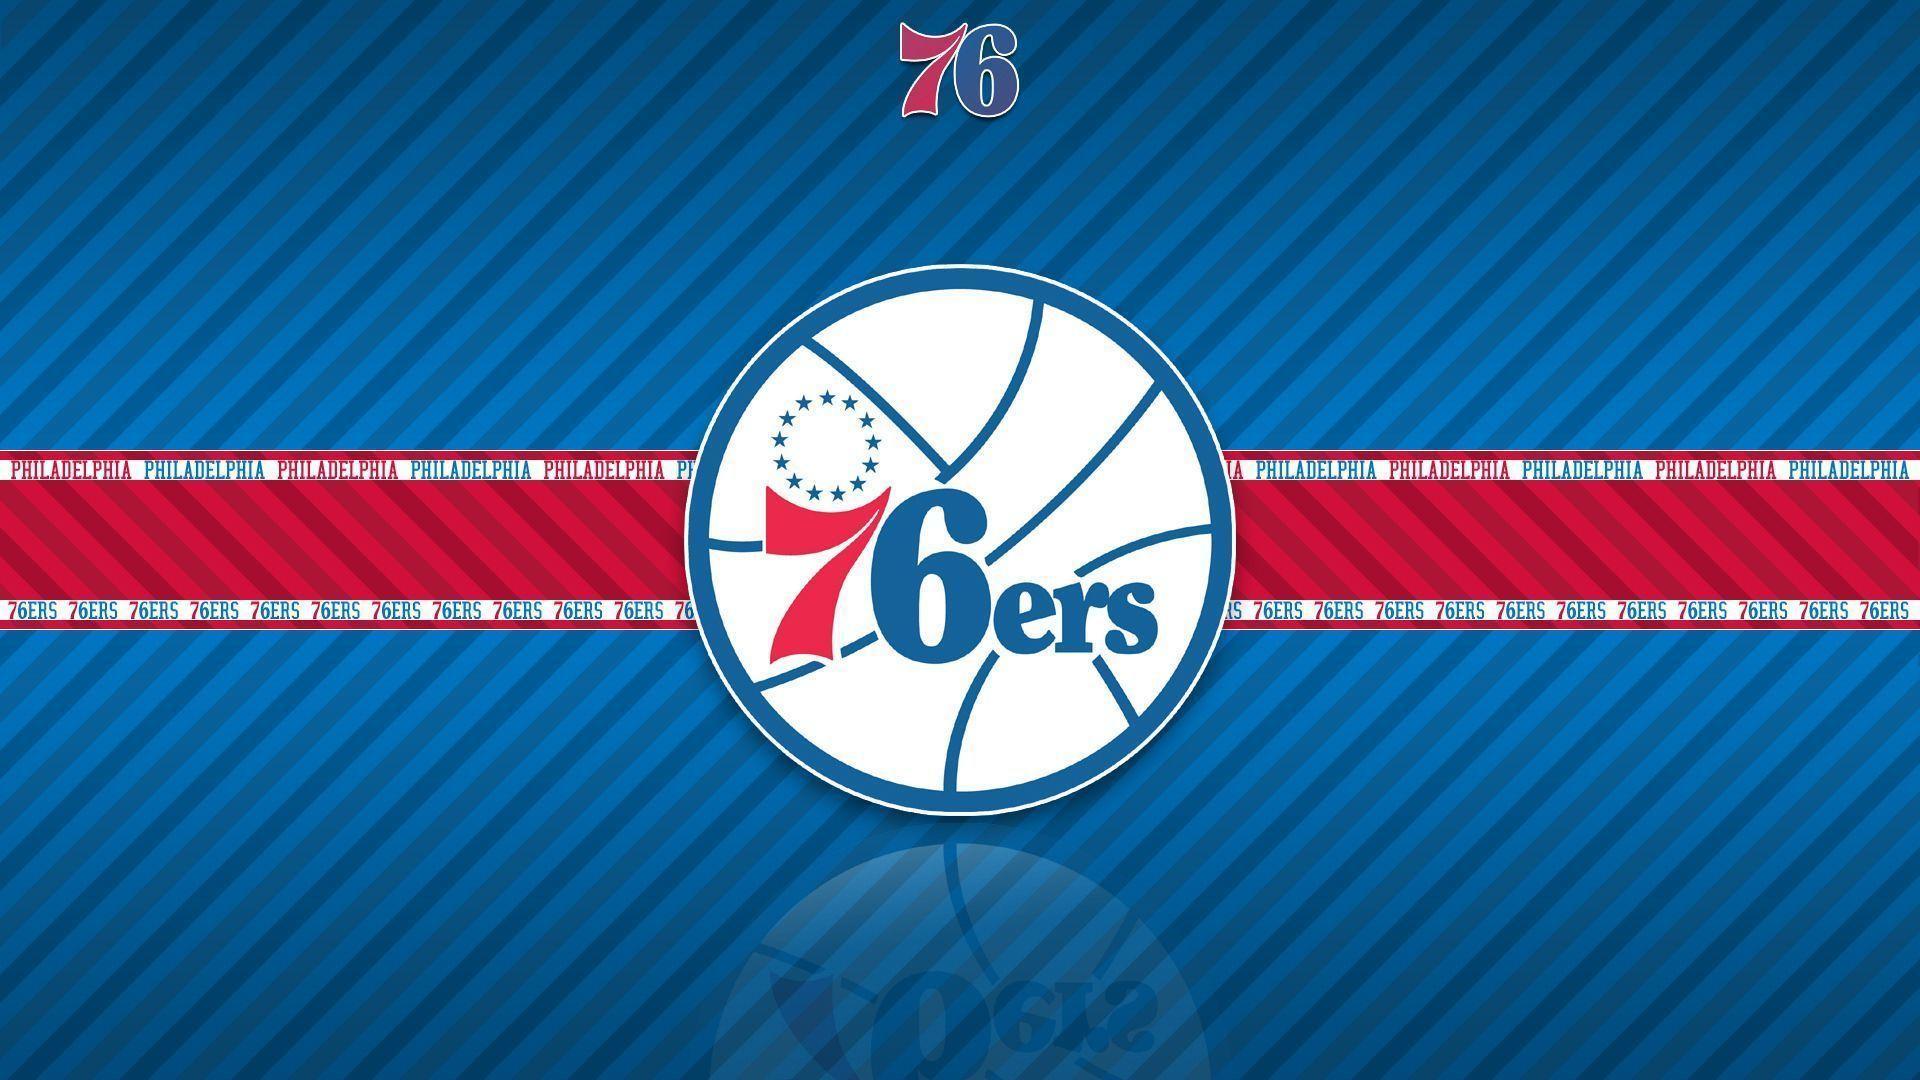 NBA Team Logos Wallpapers 2016 - Wallpaper Cave